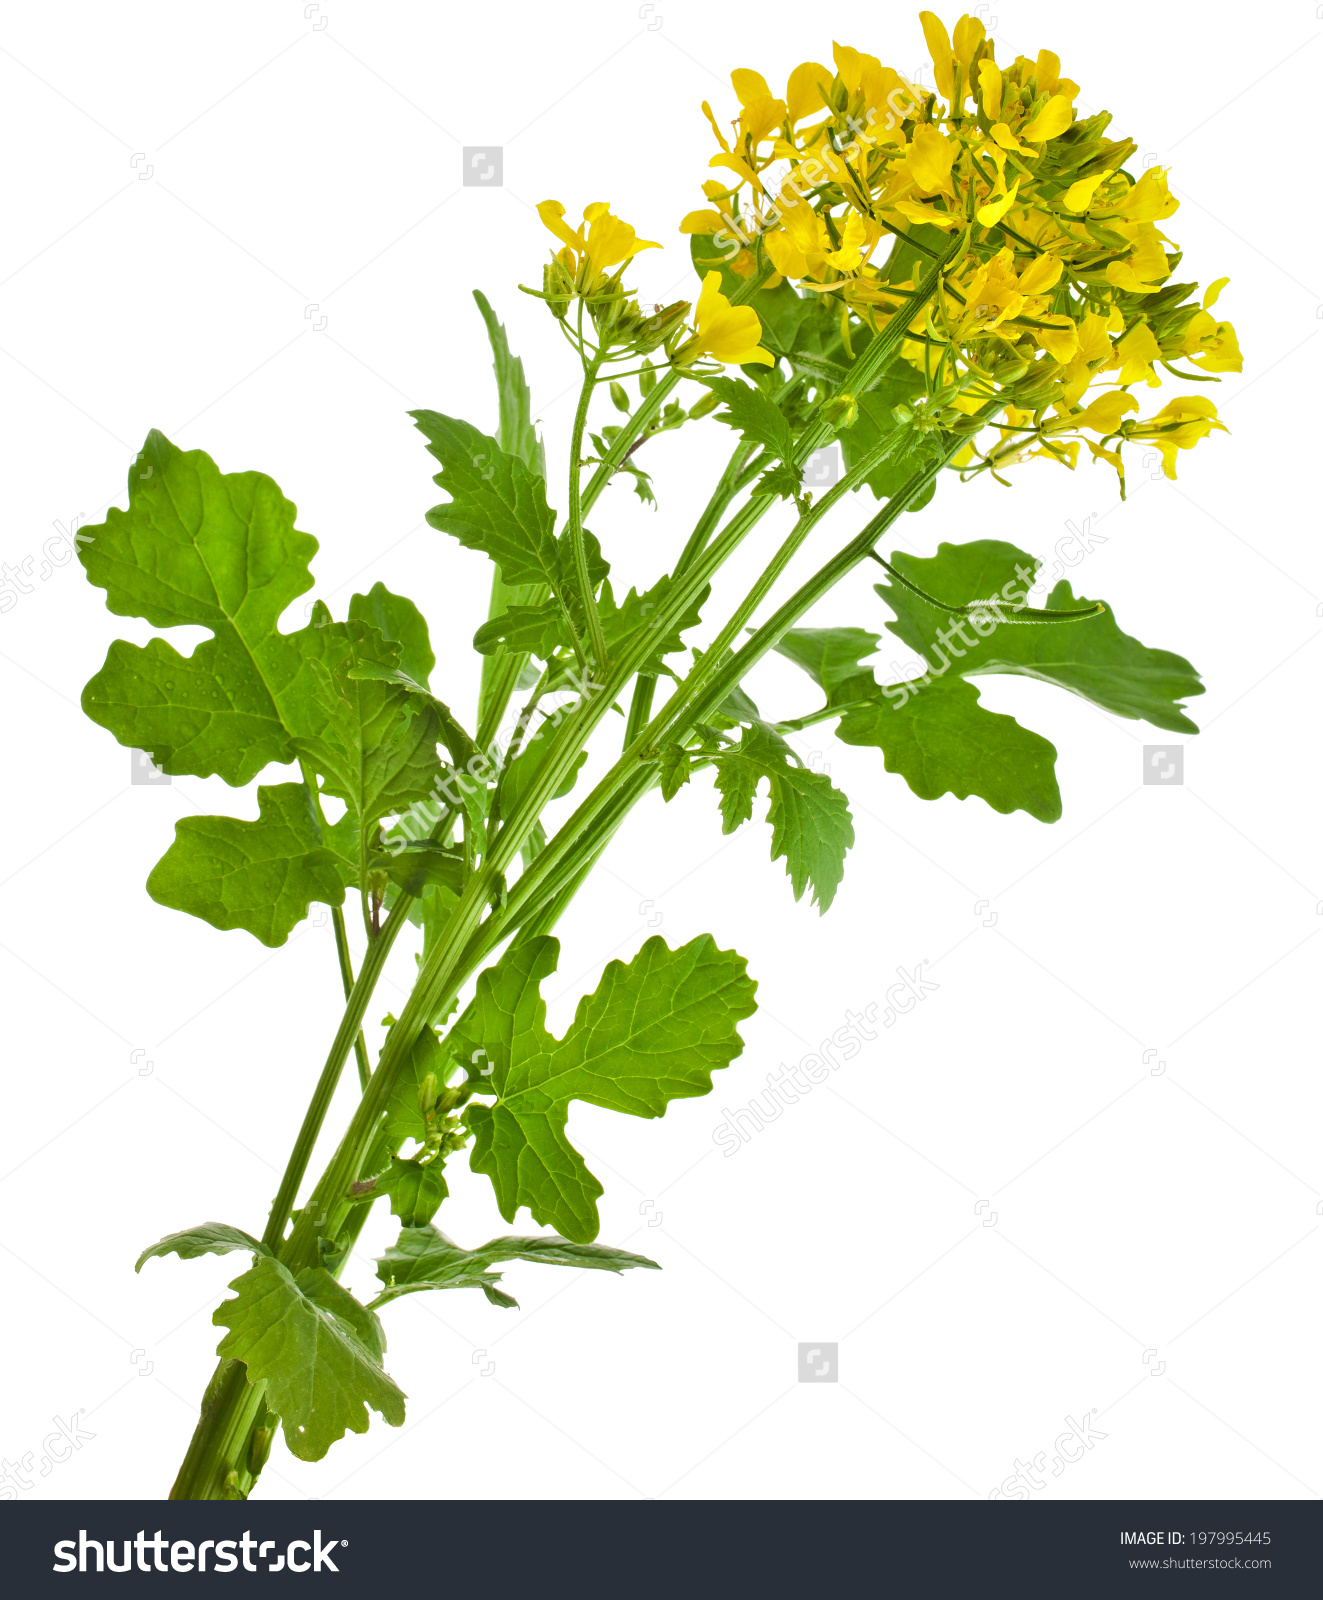 Mustard Blooming Plant Brassica Nigra Isolated Stock Photo.